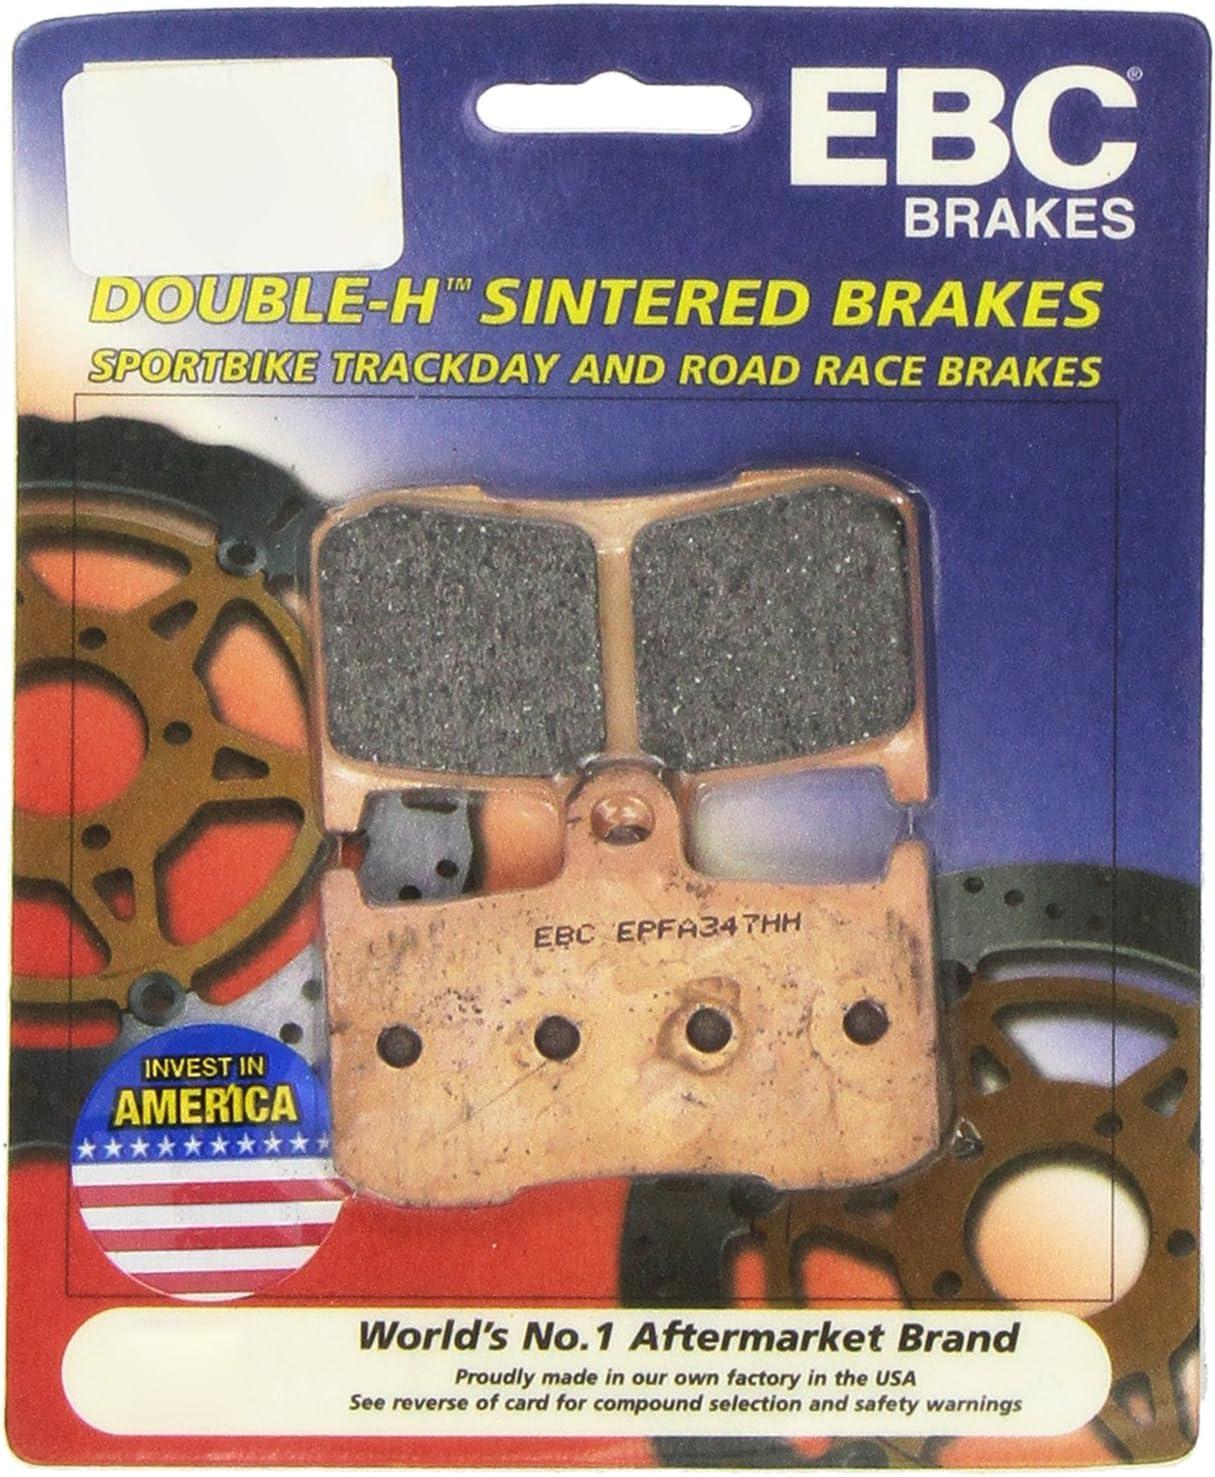 Outlaw Racing SH01SBK Motorcycle ATV Quad Mx Handle Bars Handlebar 7//8 Mini Bend Black Outlaw Racing Products